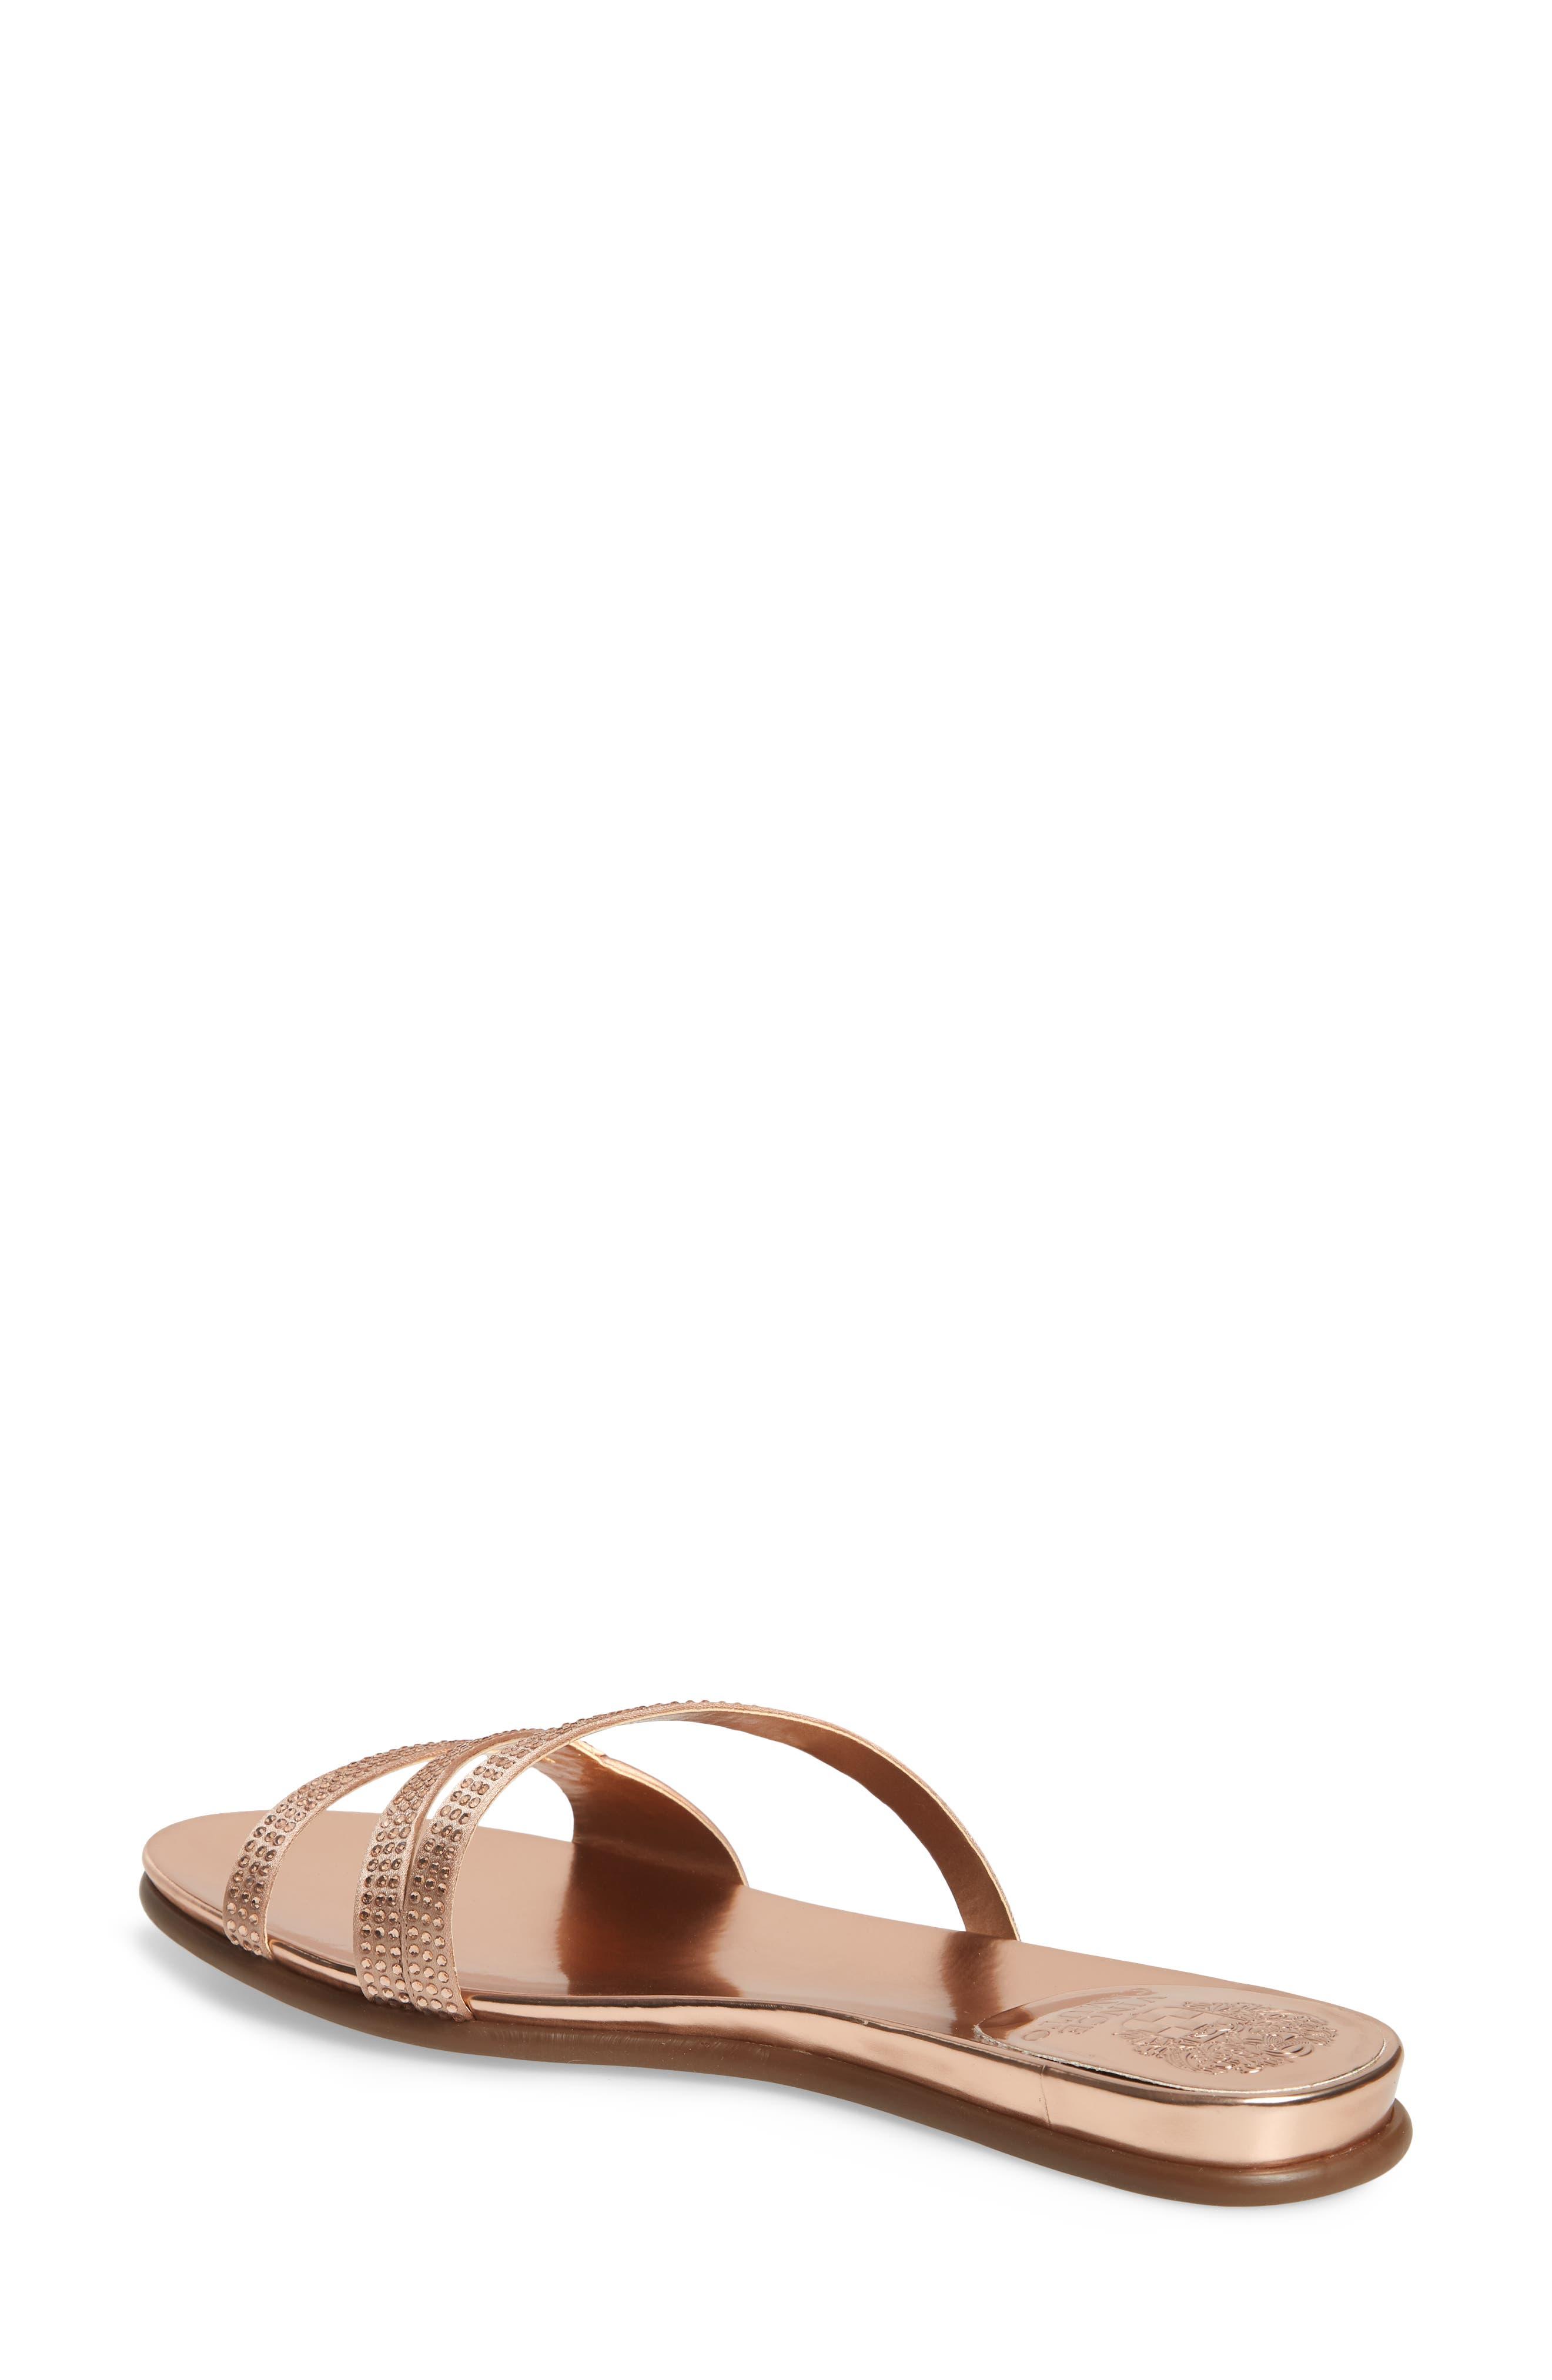 Elouisa Crystal Slide Sandal,                             Alternate thumbnail 2, color,                             Pink Bisque Satin